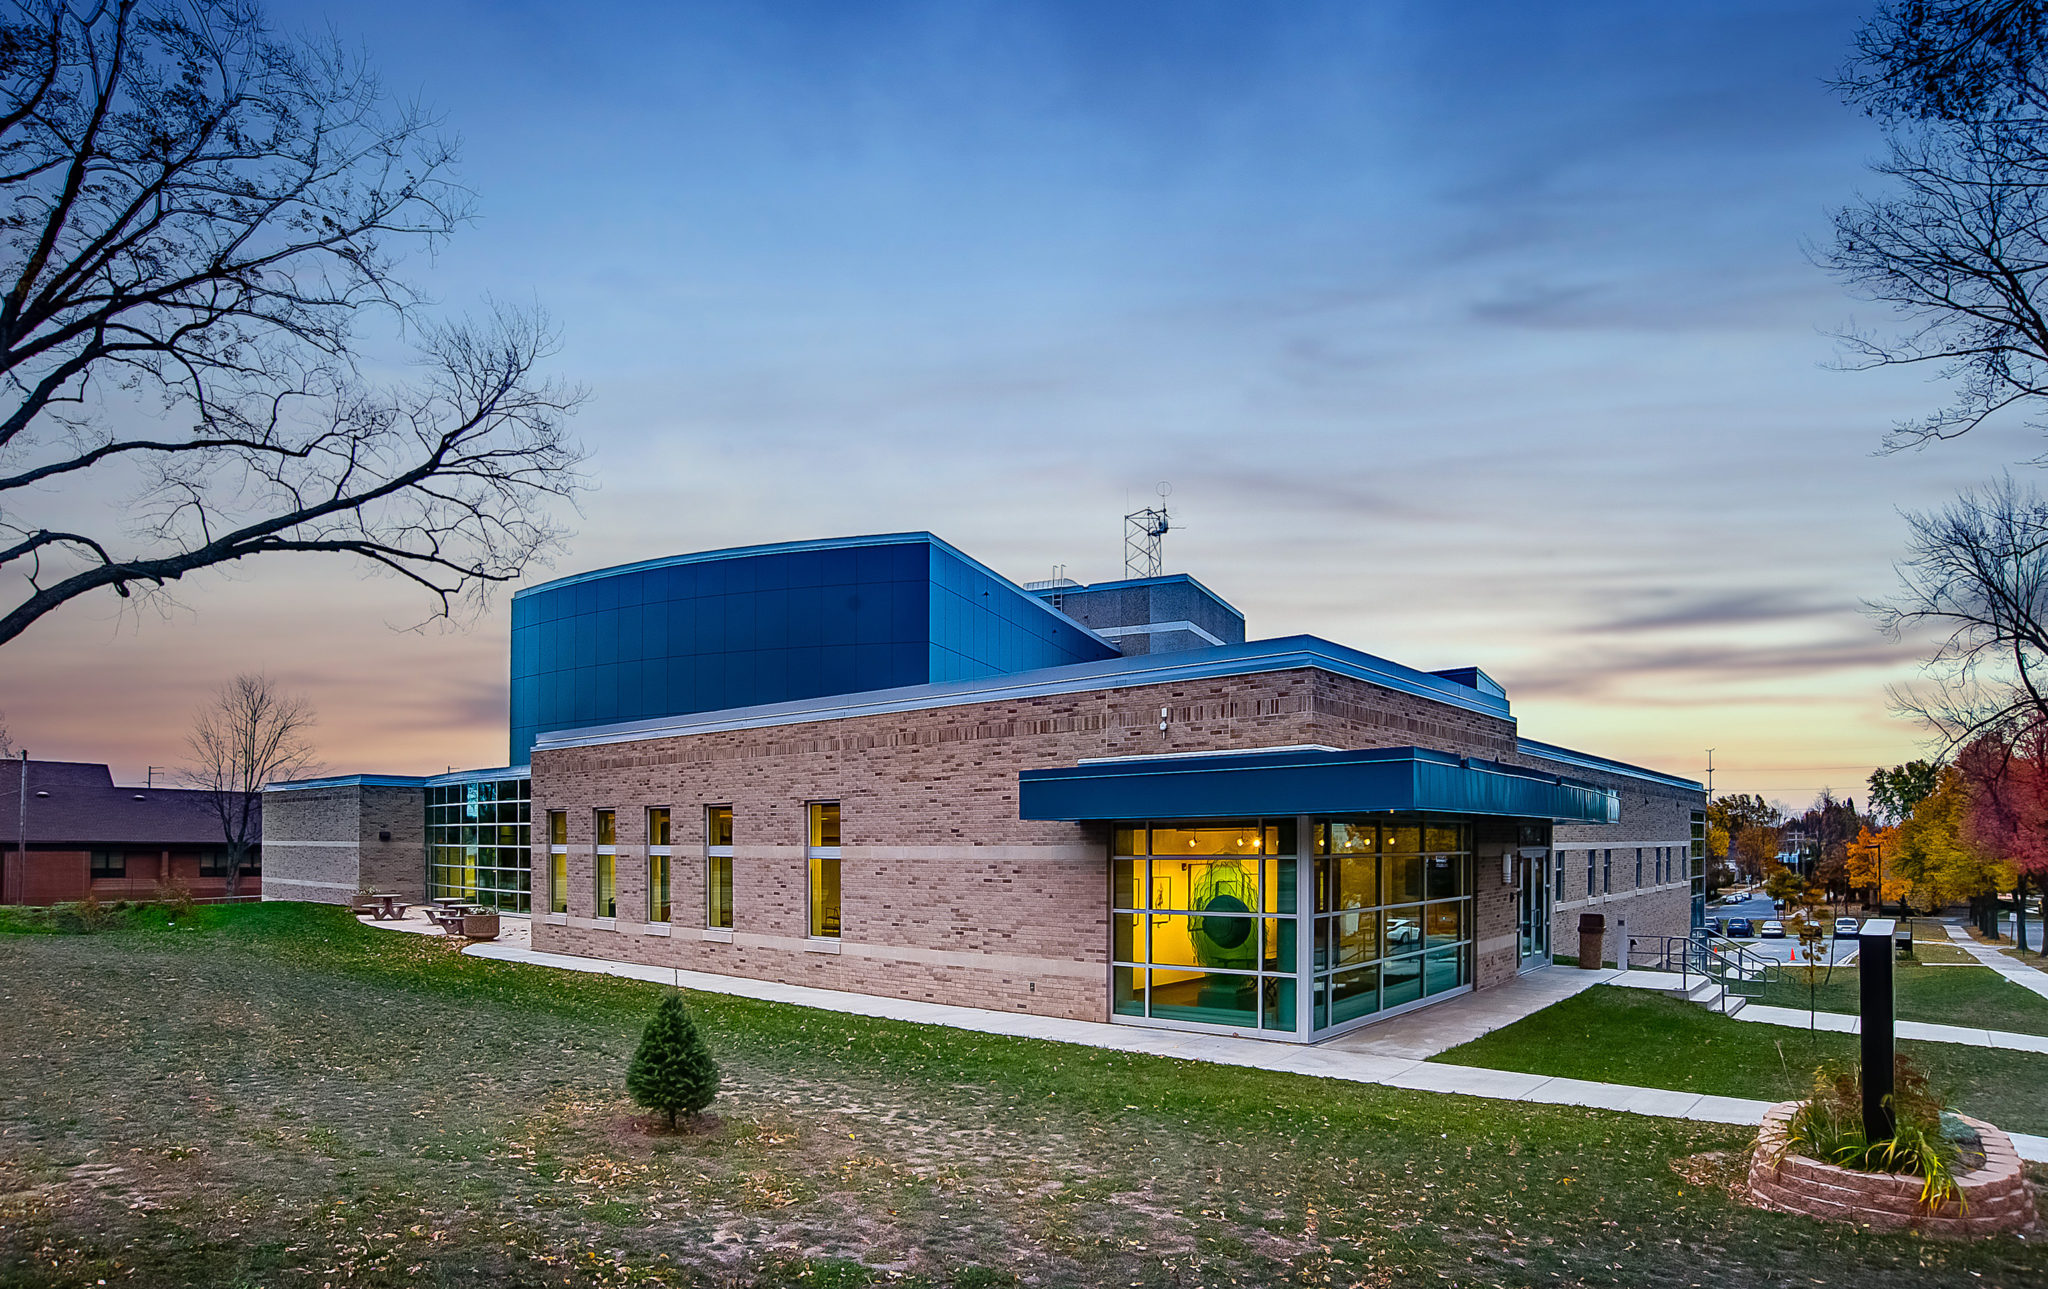 2_UWMC Center for Civic Engagement